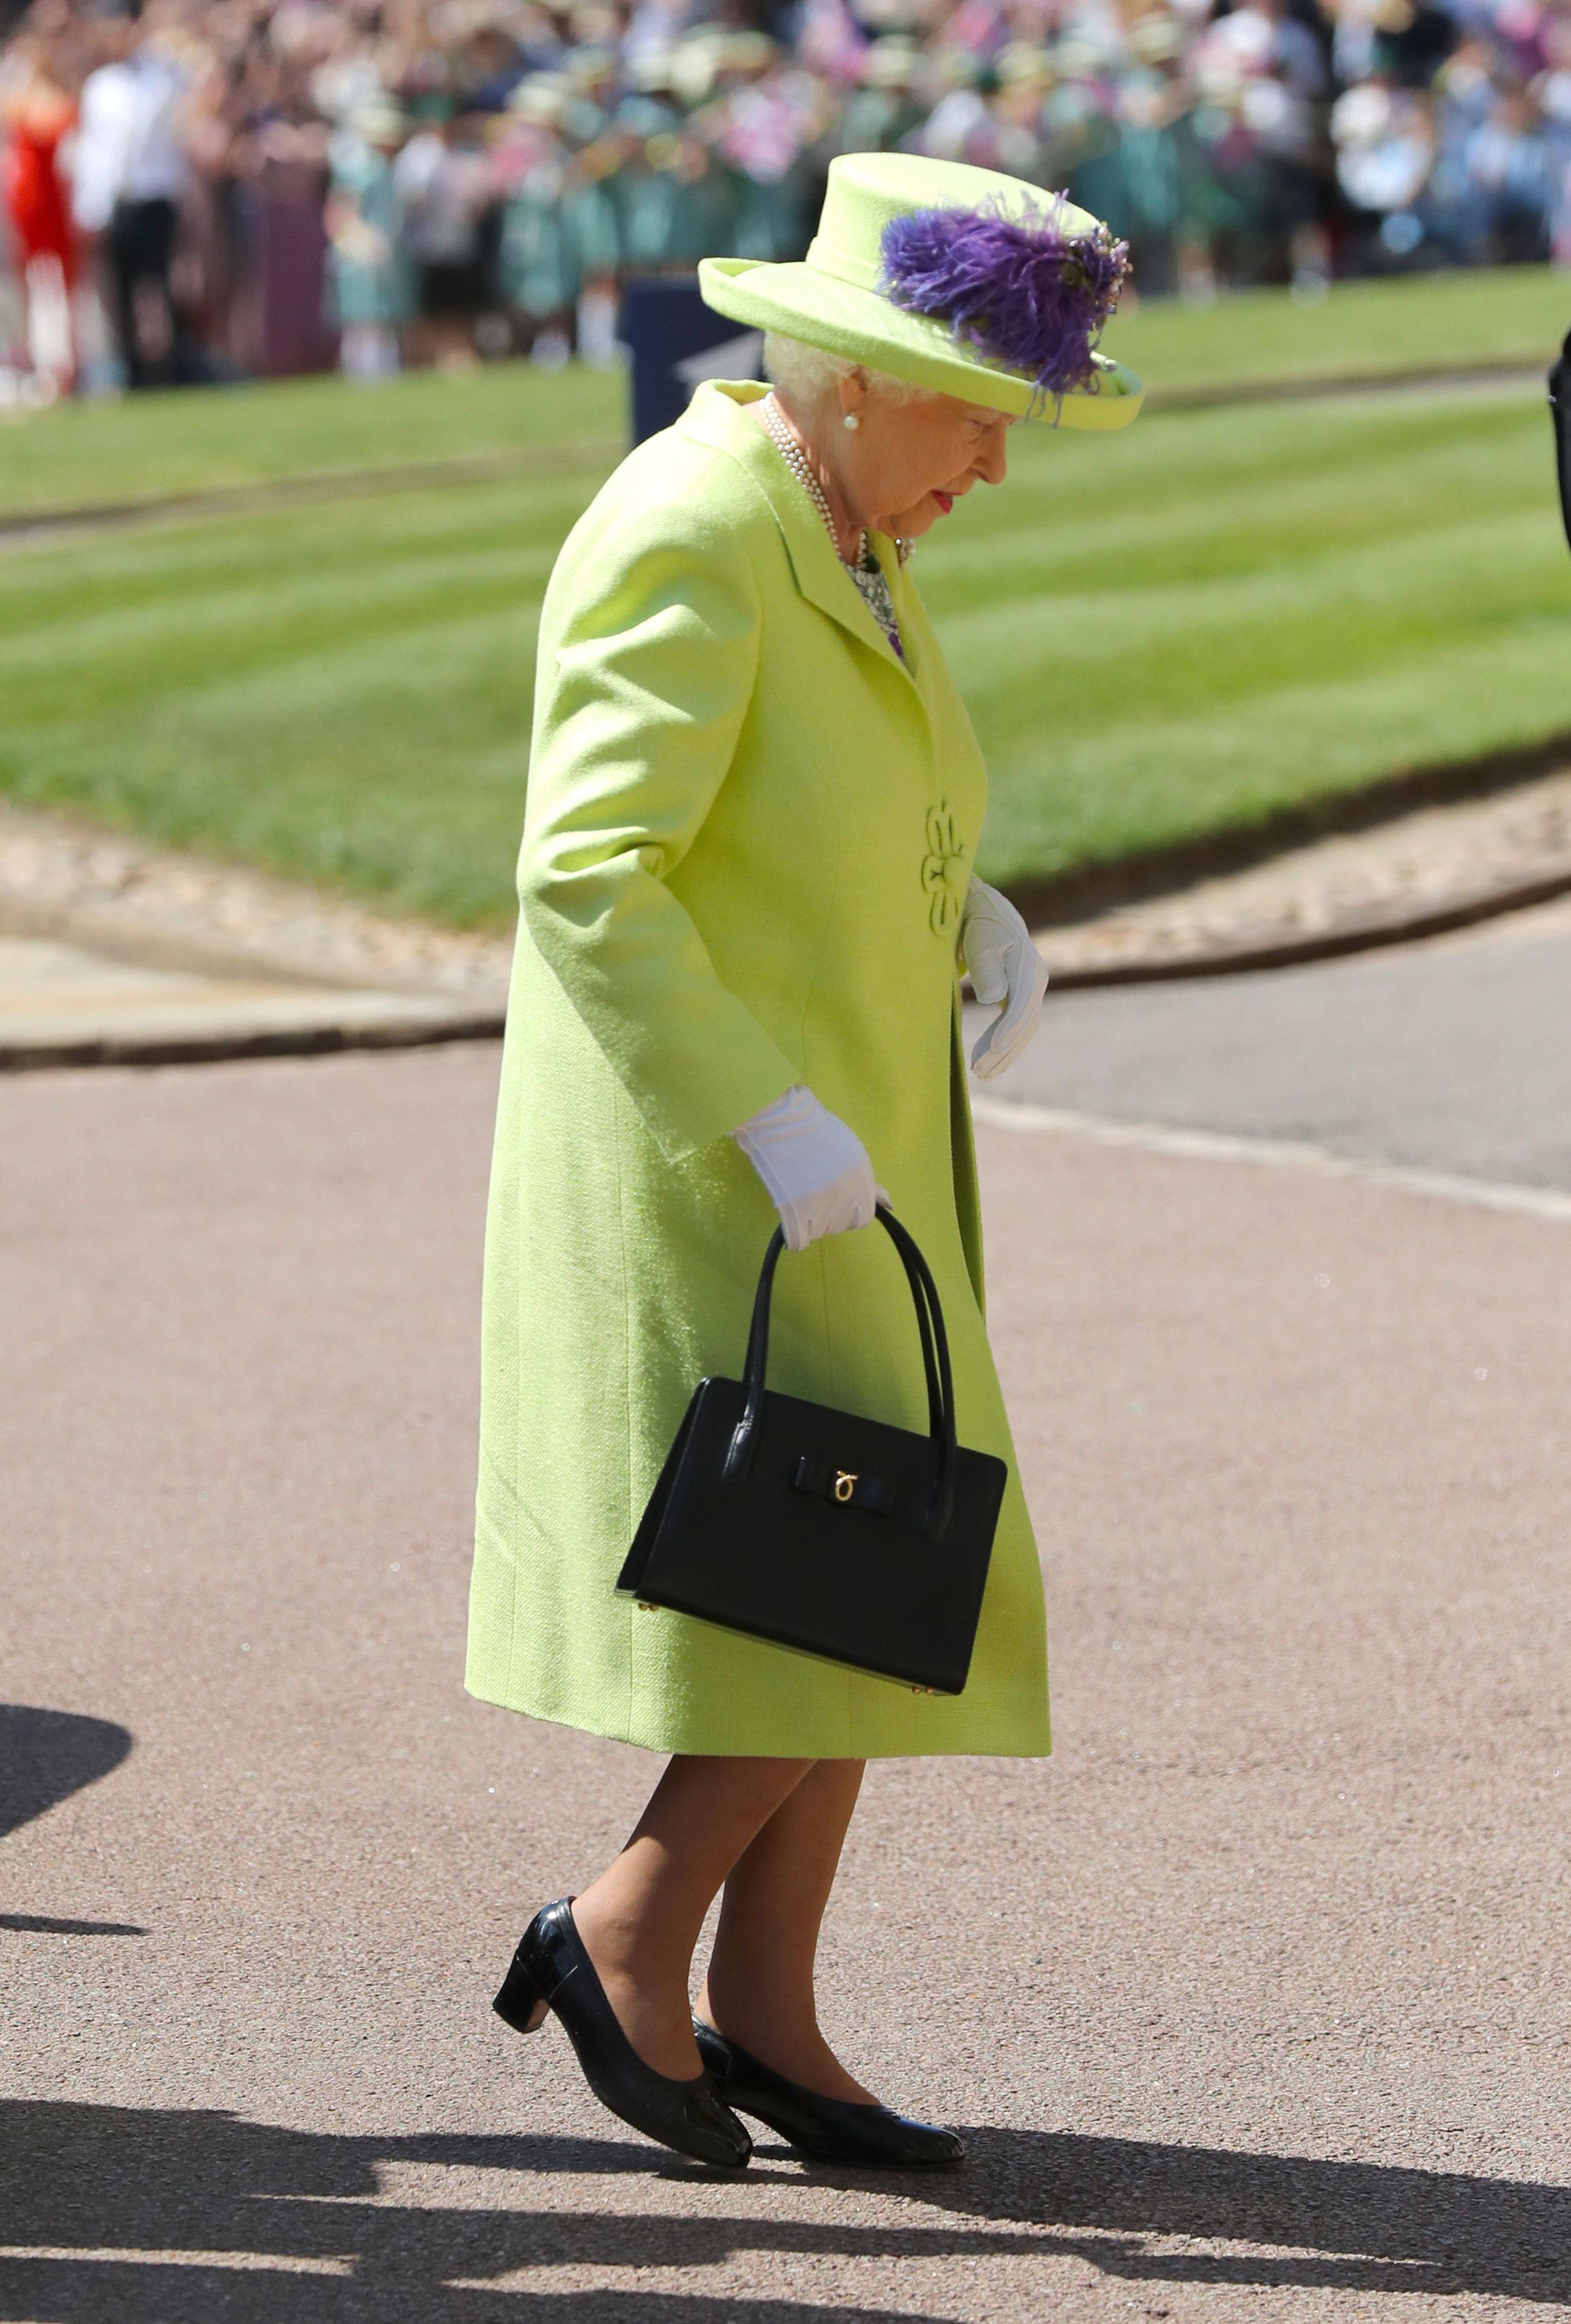 la-soberana-britanica-de-verde-menta